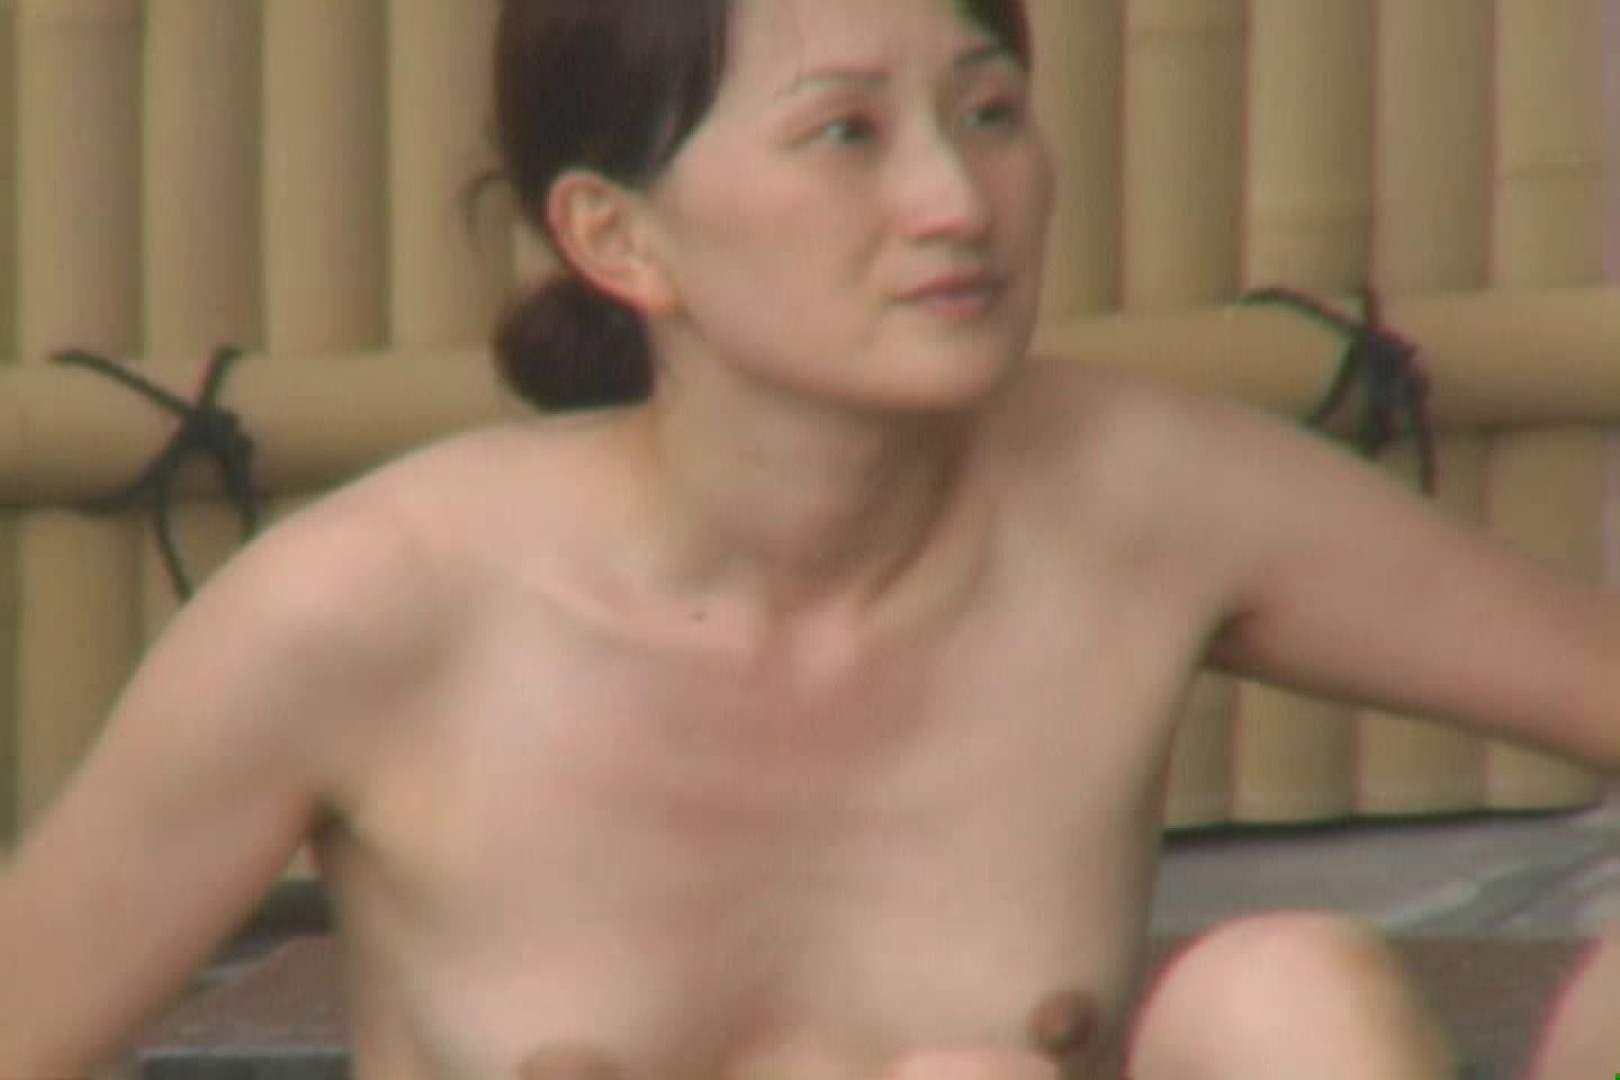 Aquaな露天風呂Vol.578 OL女体 われめAV動画紹介 77連発 53